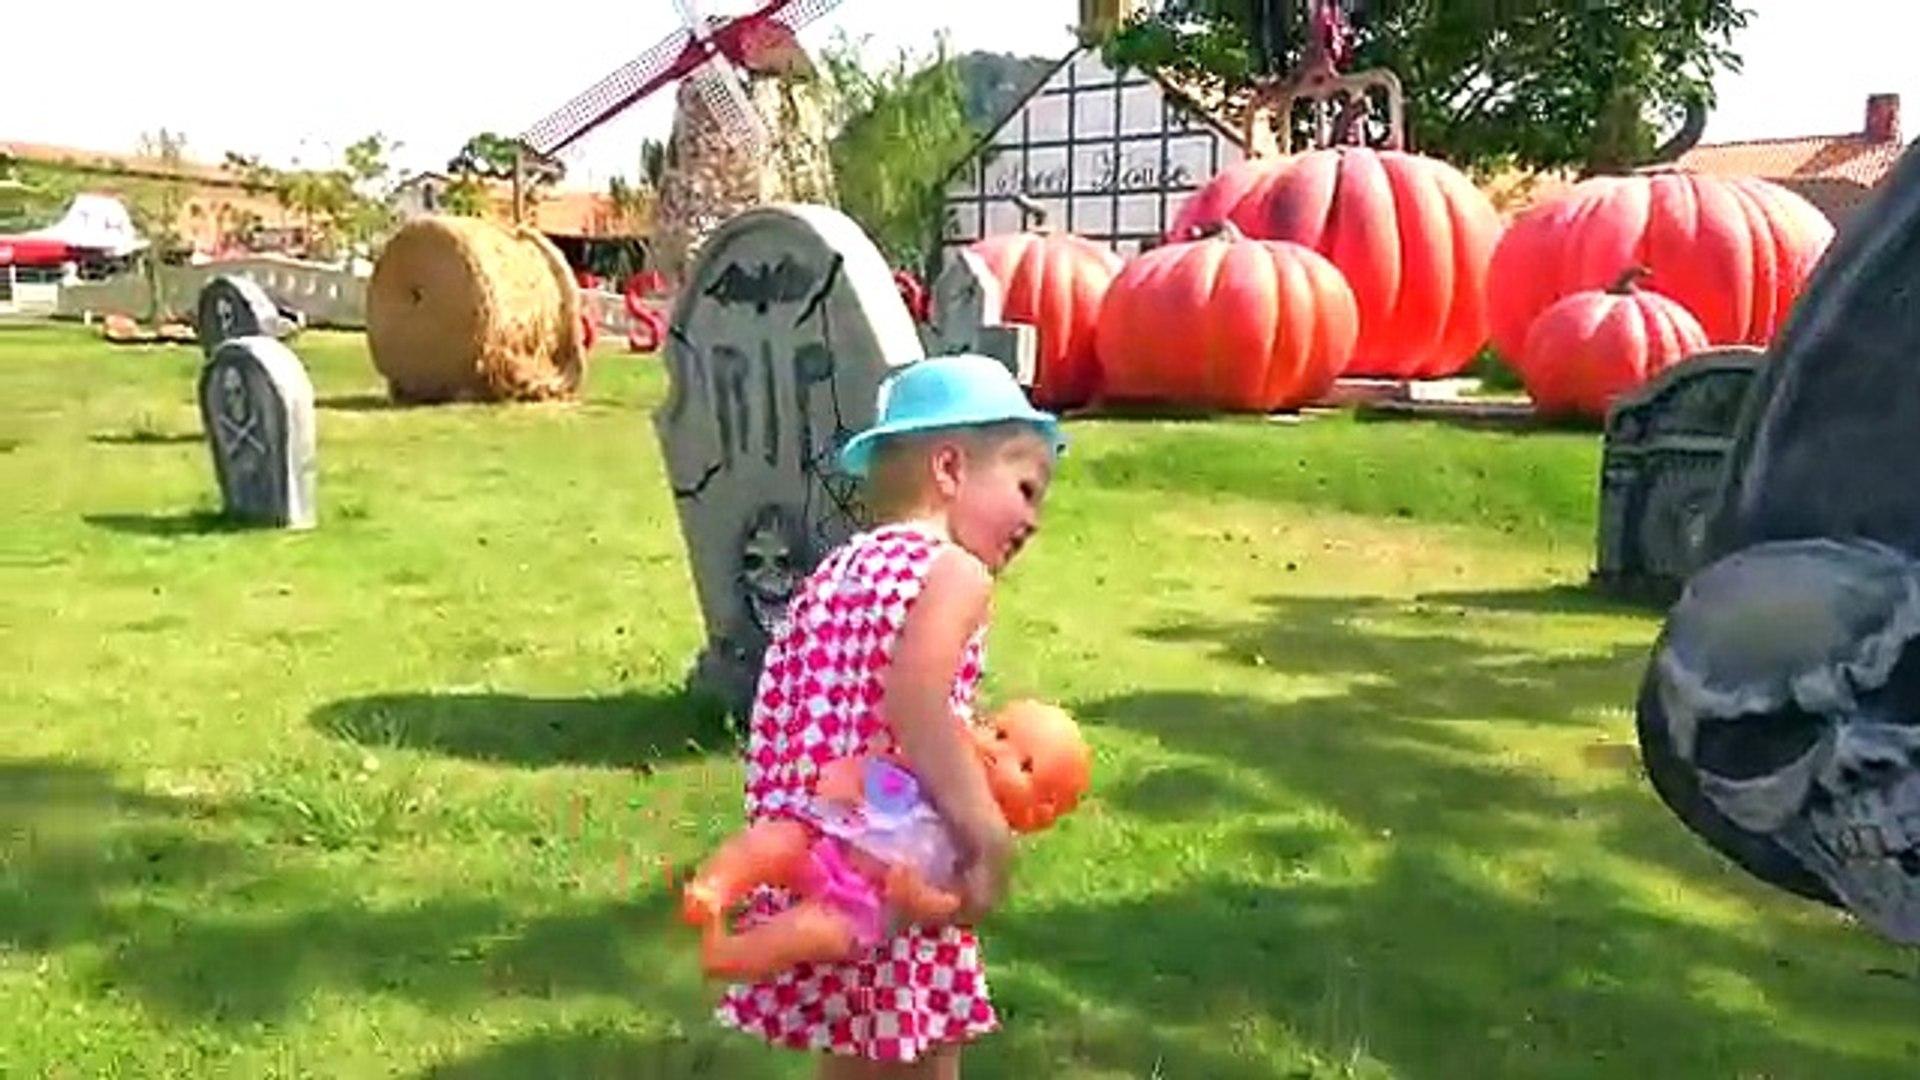 Bad baby Настя уехала в парк и в перевернутый дом Good girl rides to the farm Funny video